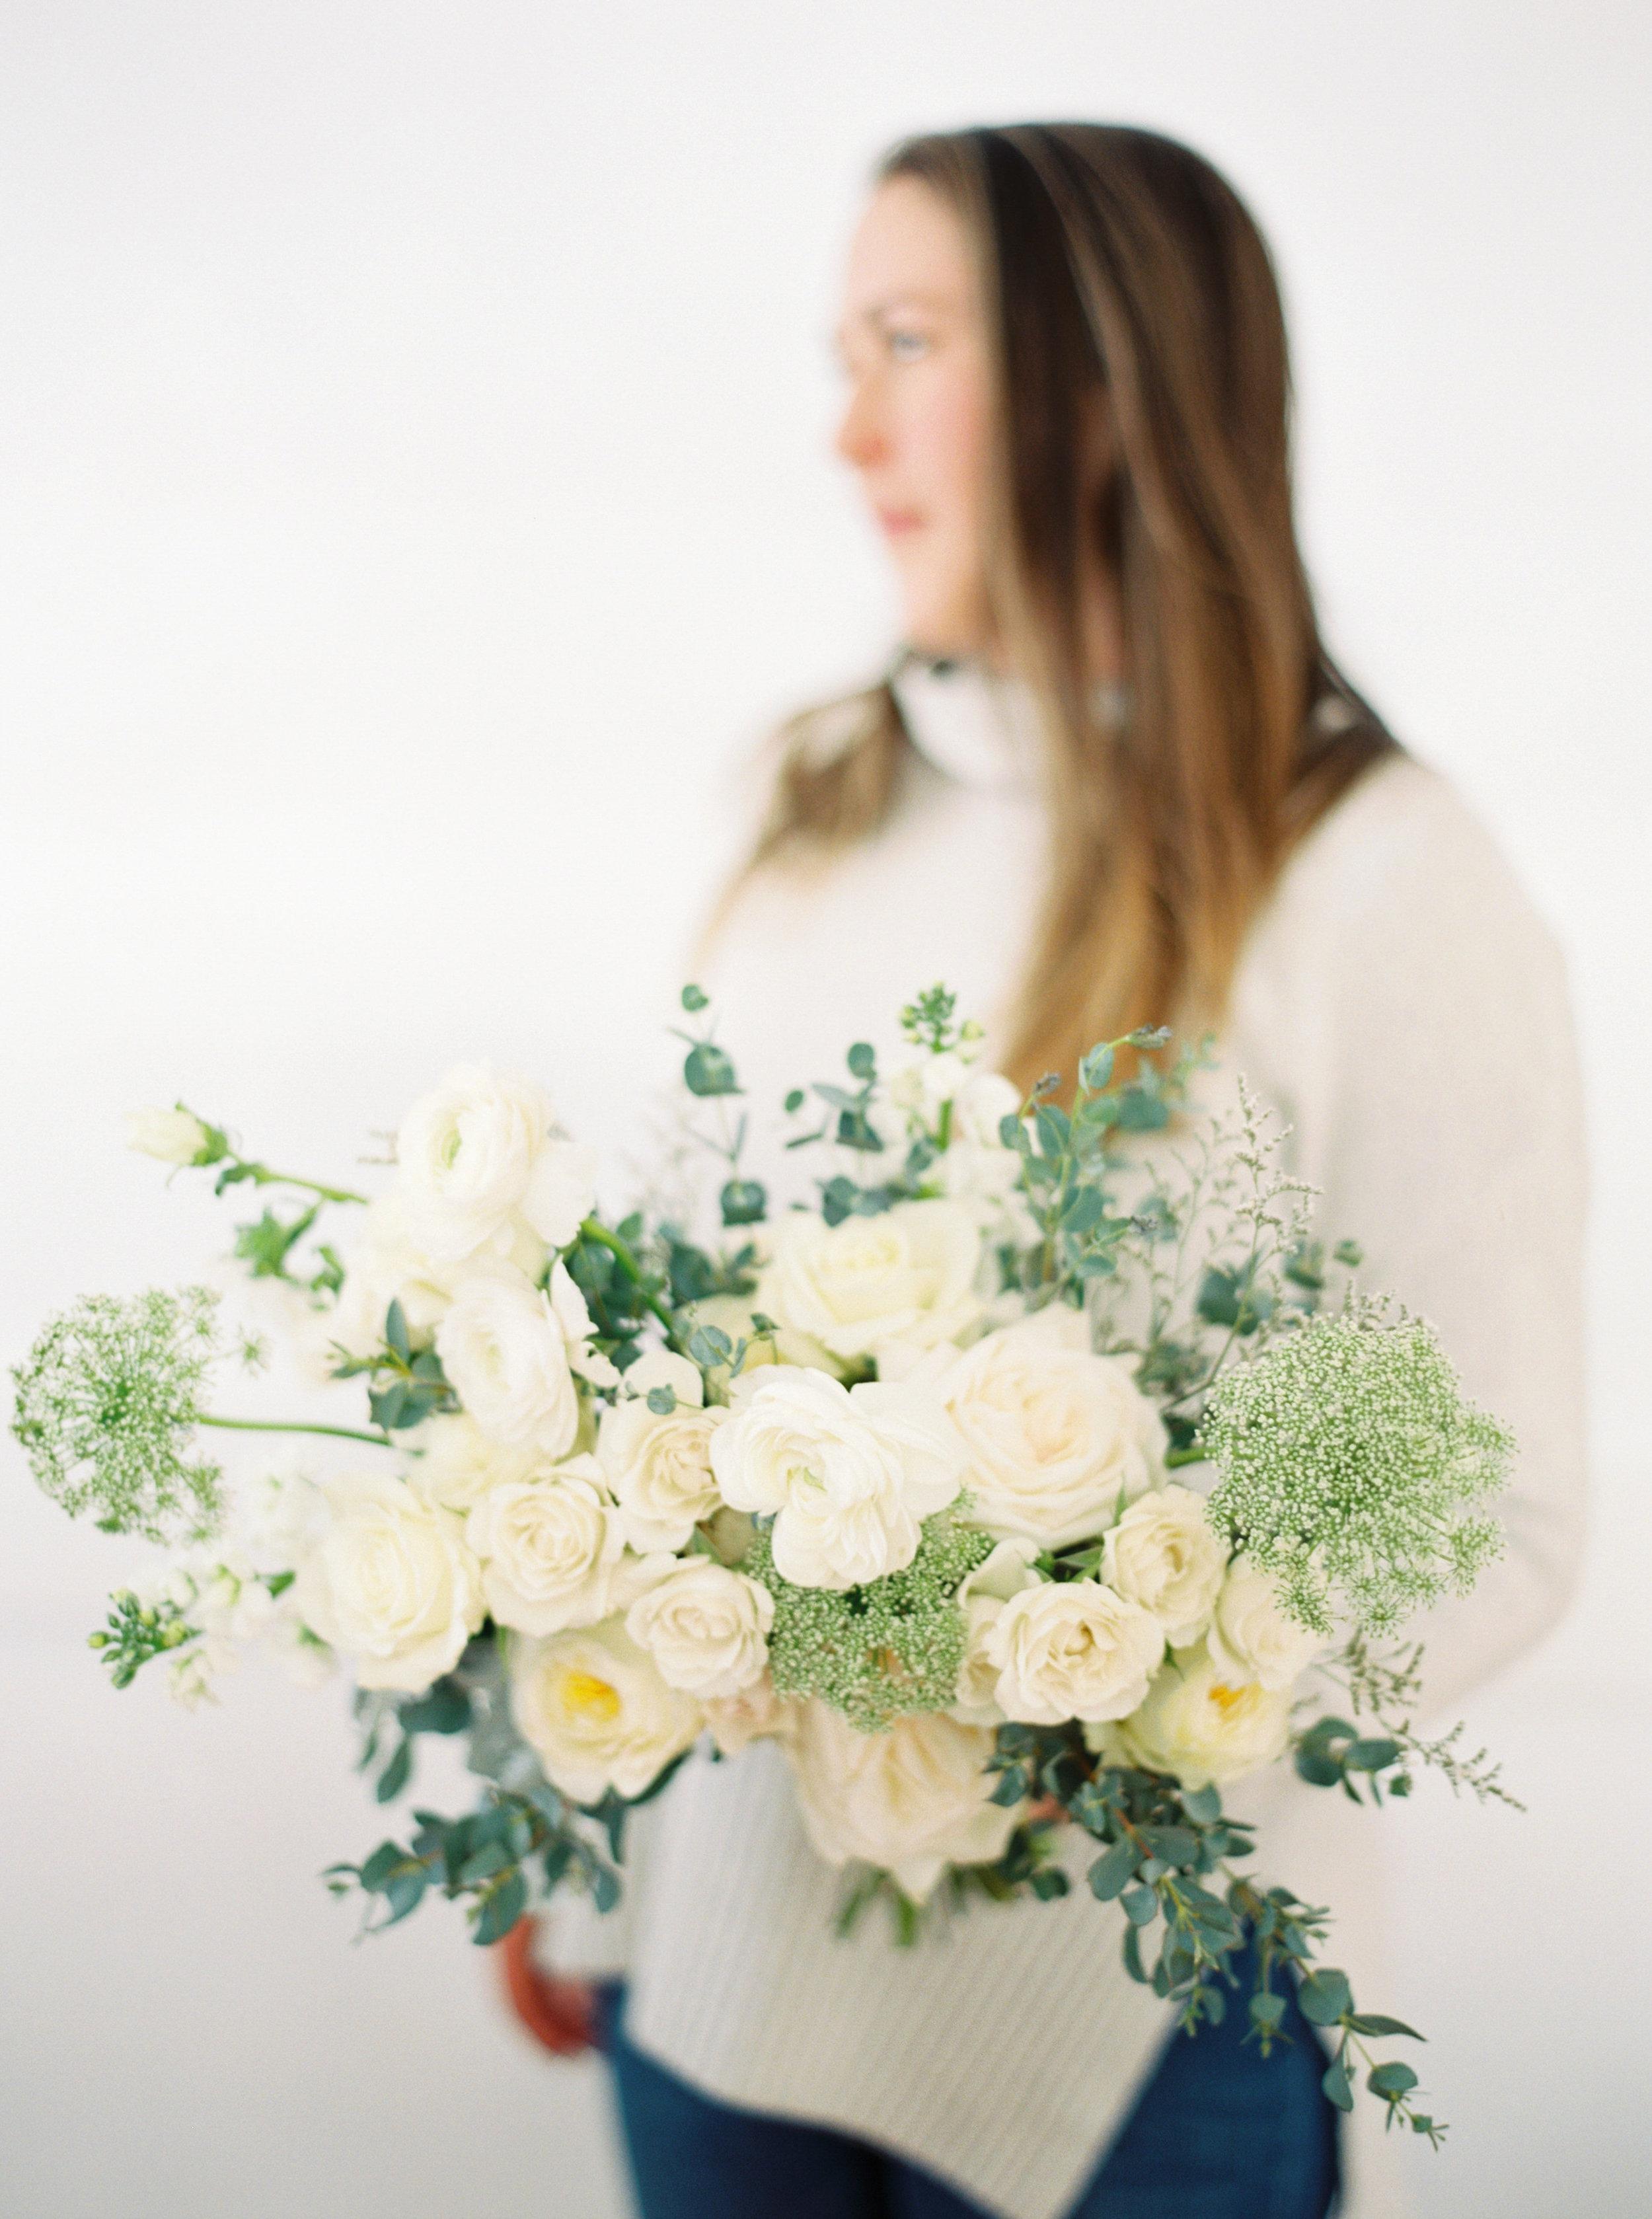 Owensboro Evansville Henderson Newburgh Wedding Flowers Florist00048.jpg